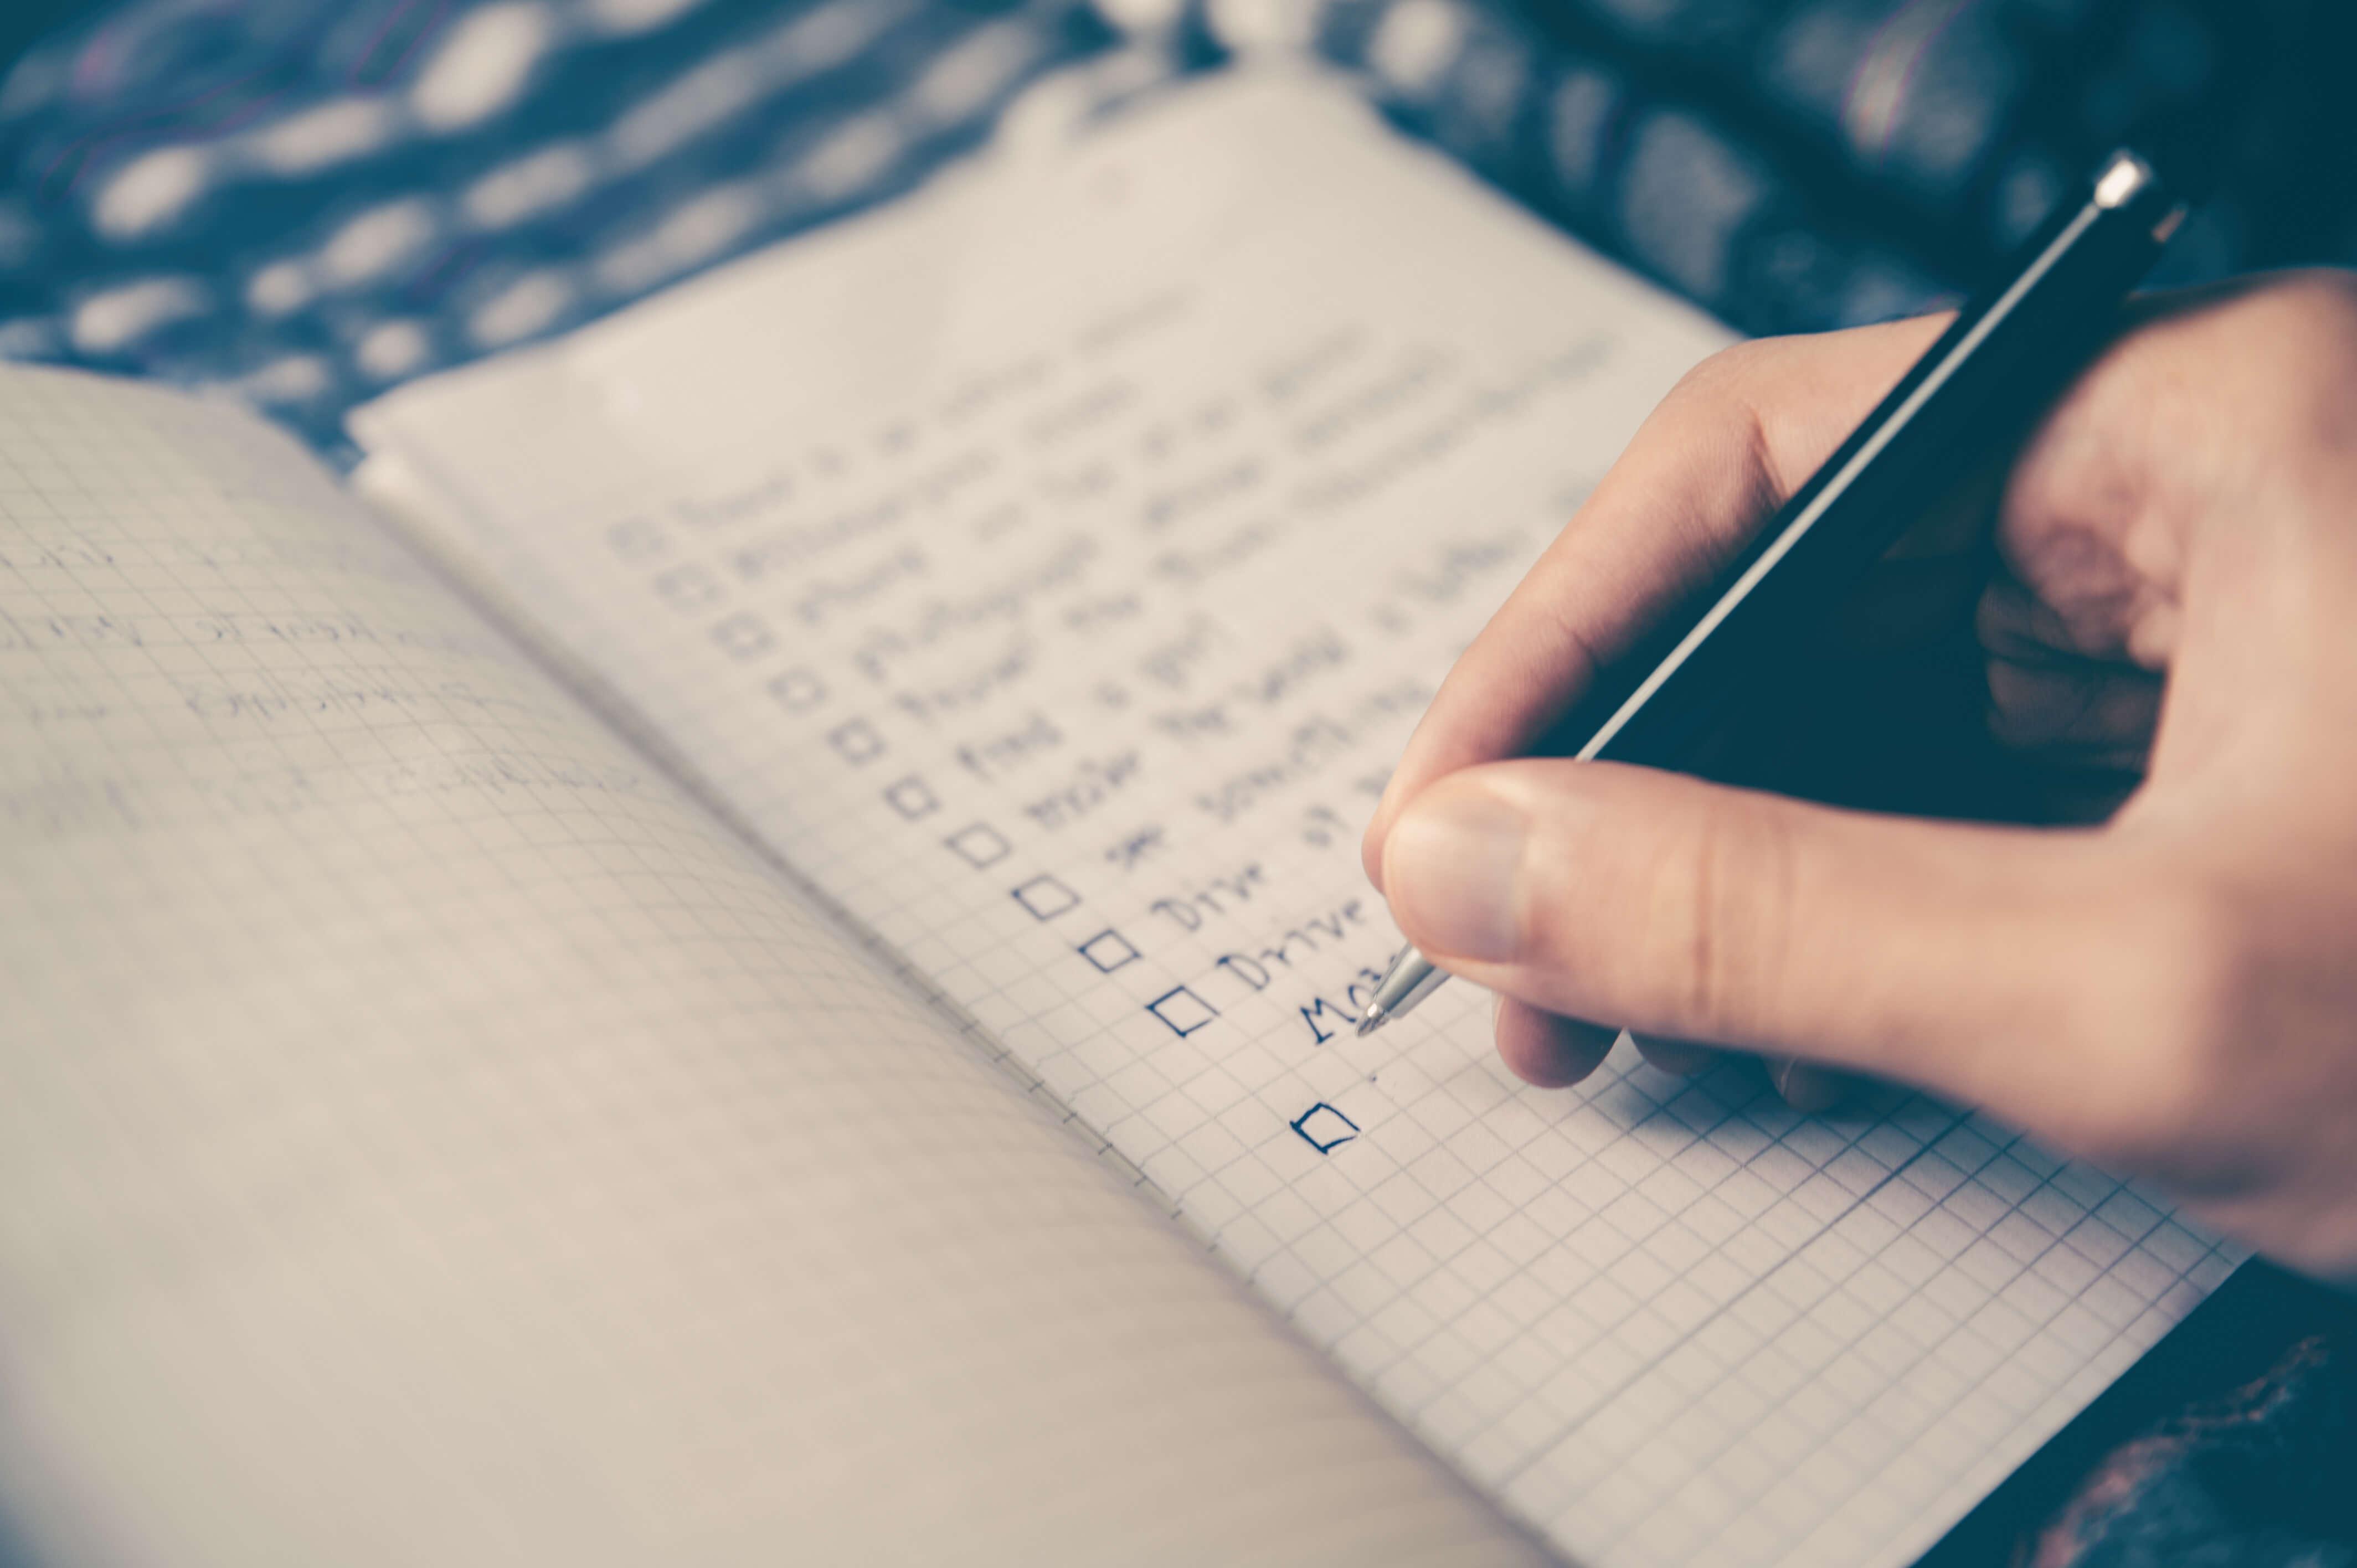 Ten steps to GDPR compliance